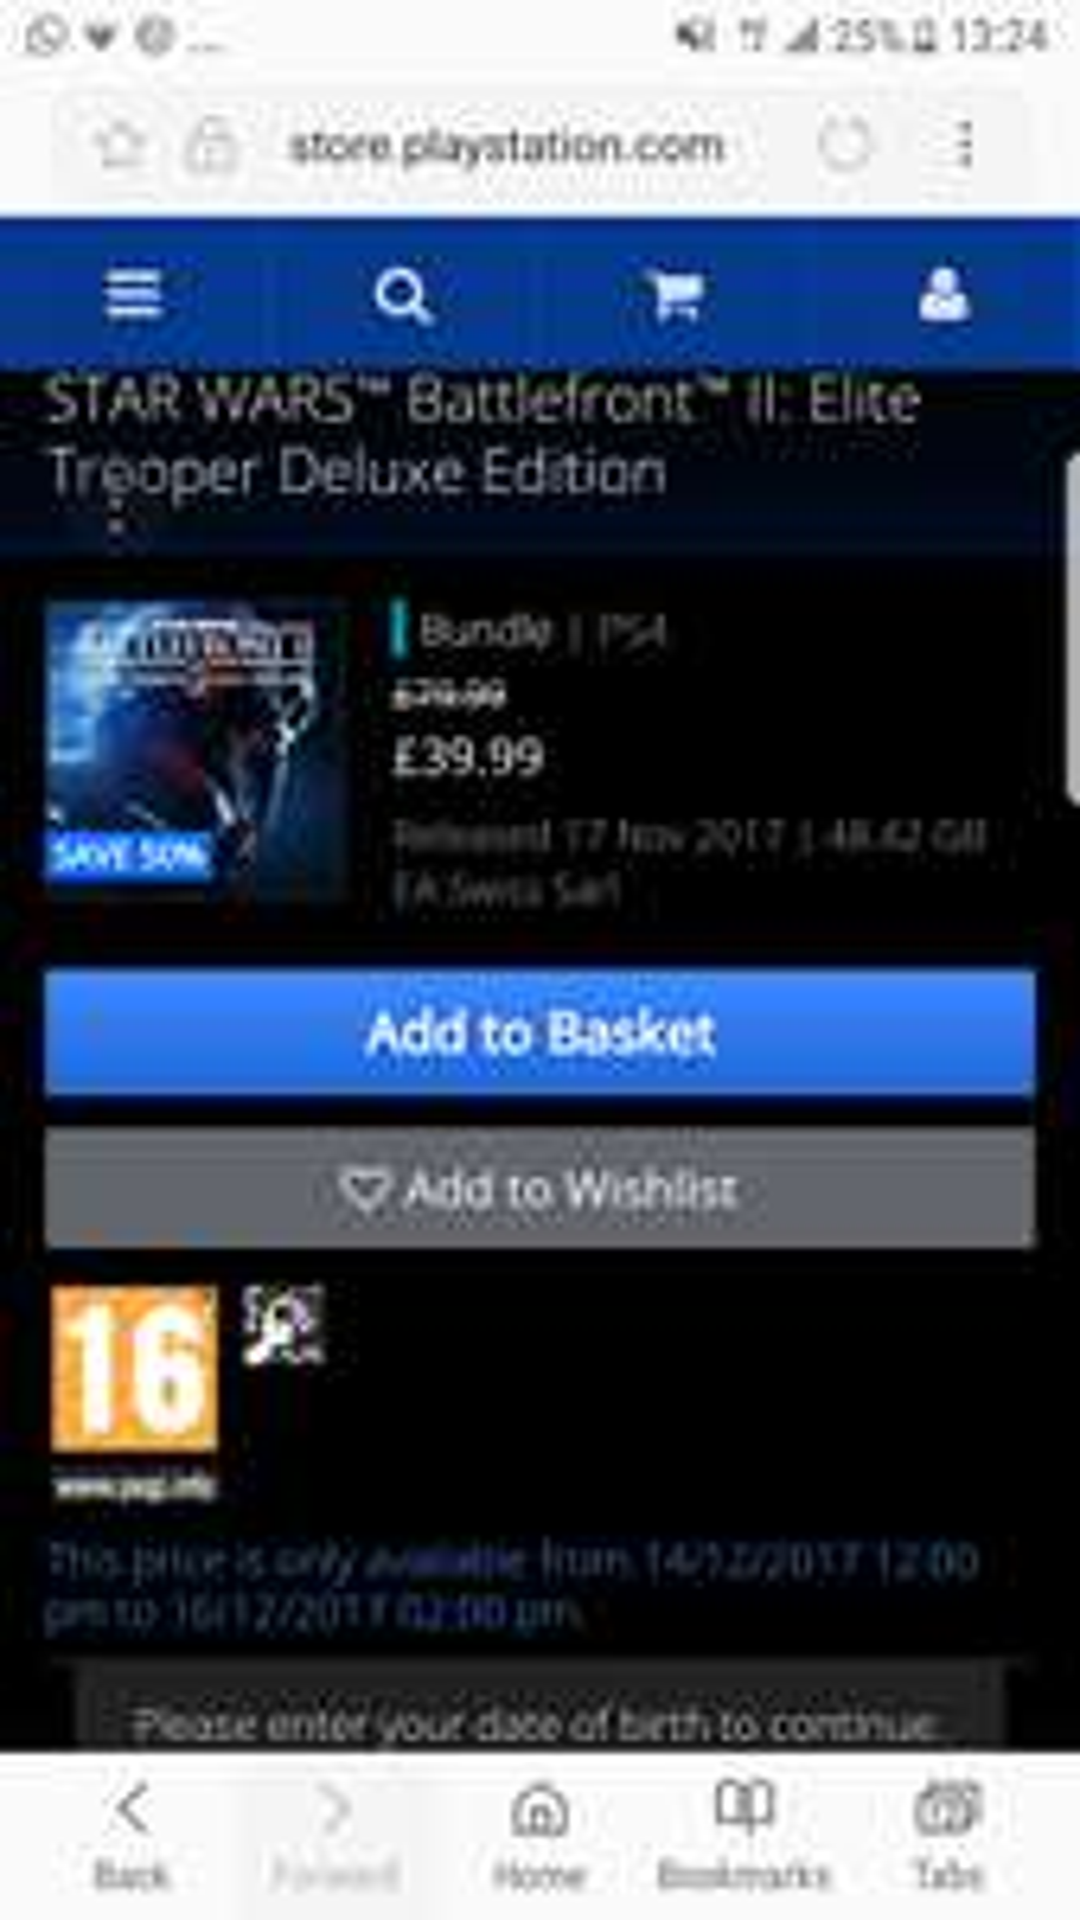 BATTLEFRONT 2 ELITE TROOPER EDITION ps4 store 50% off - £39.99